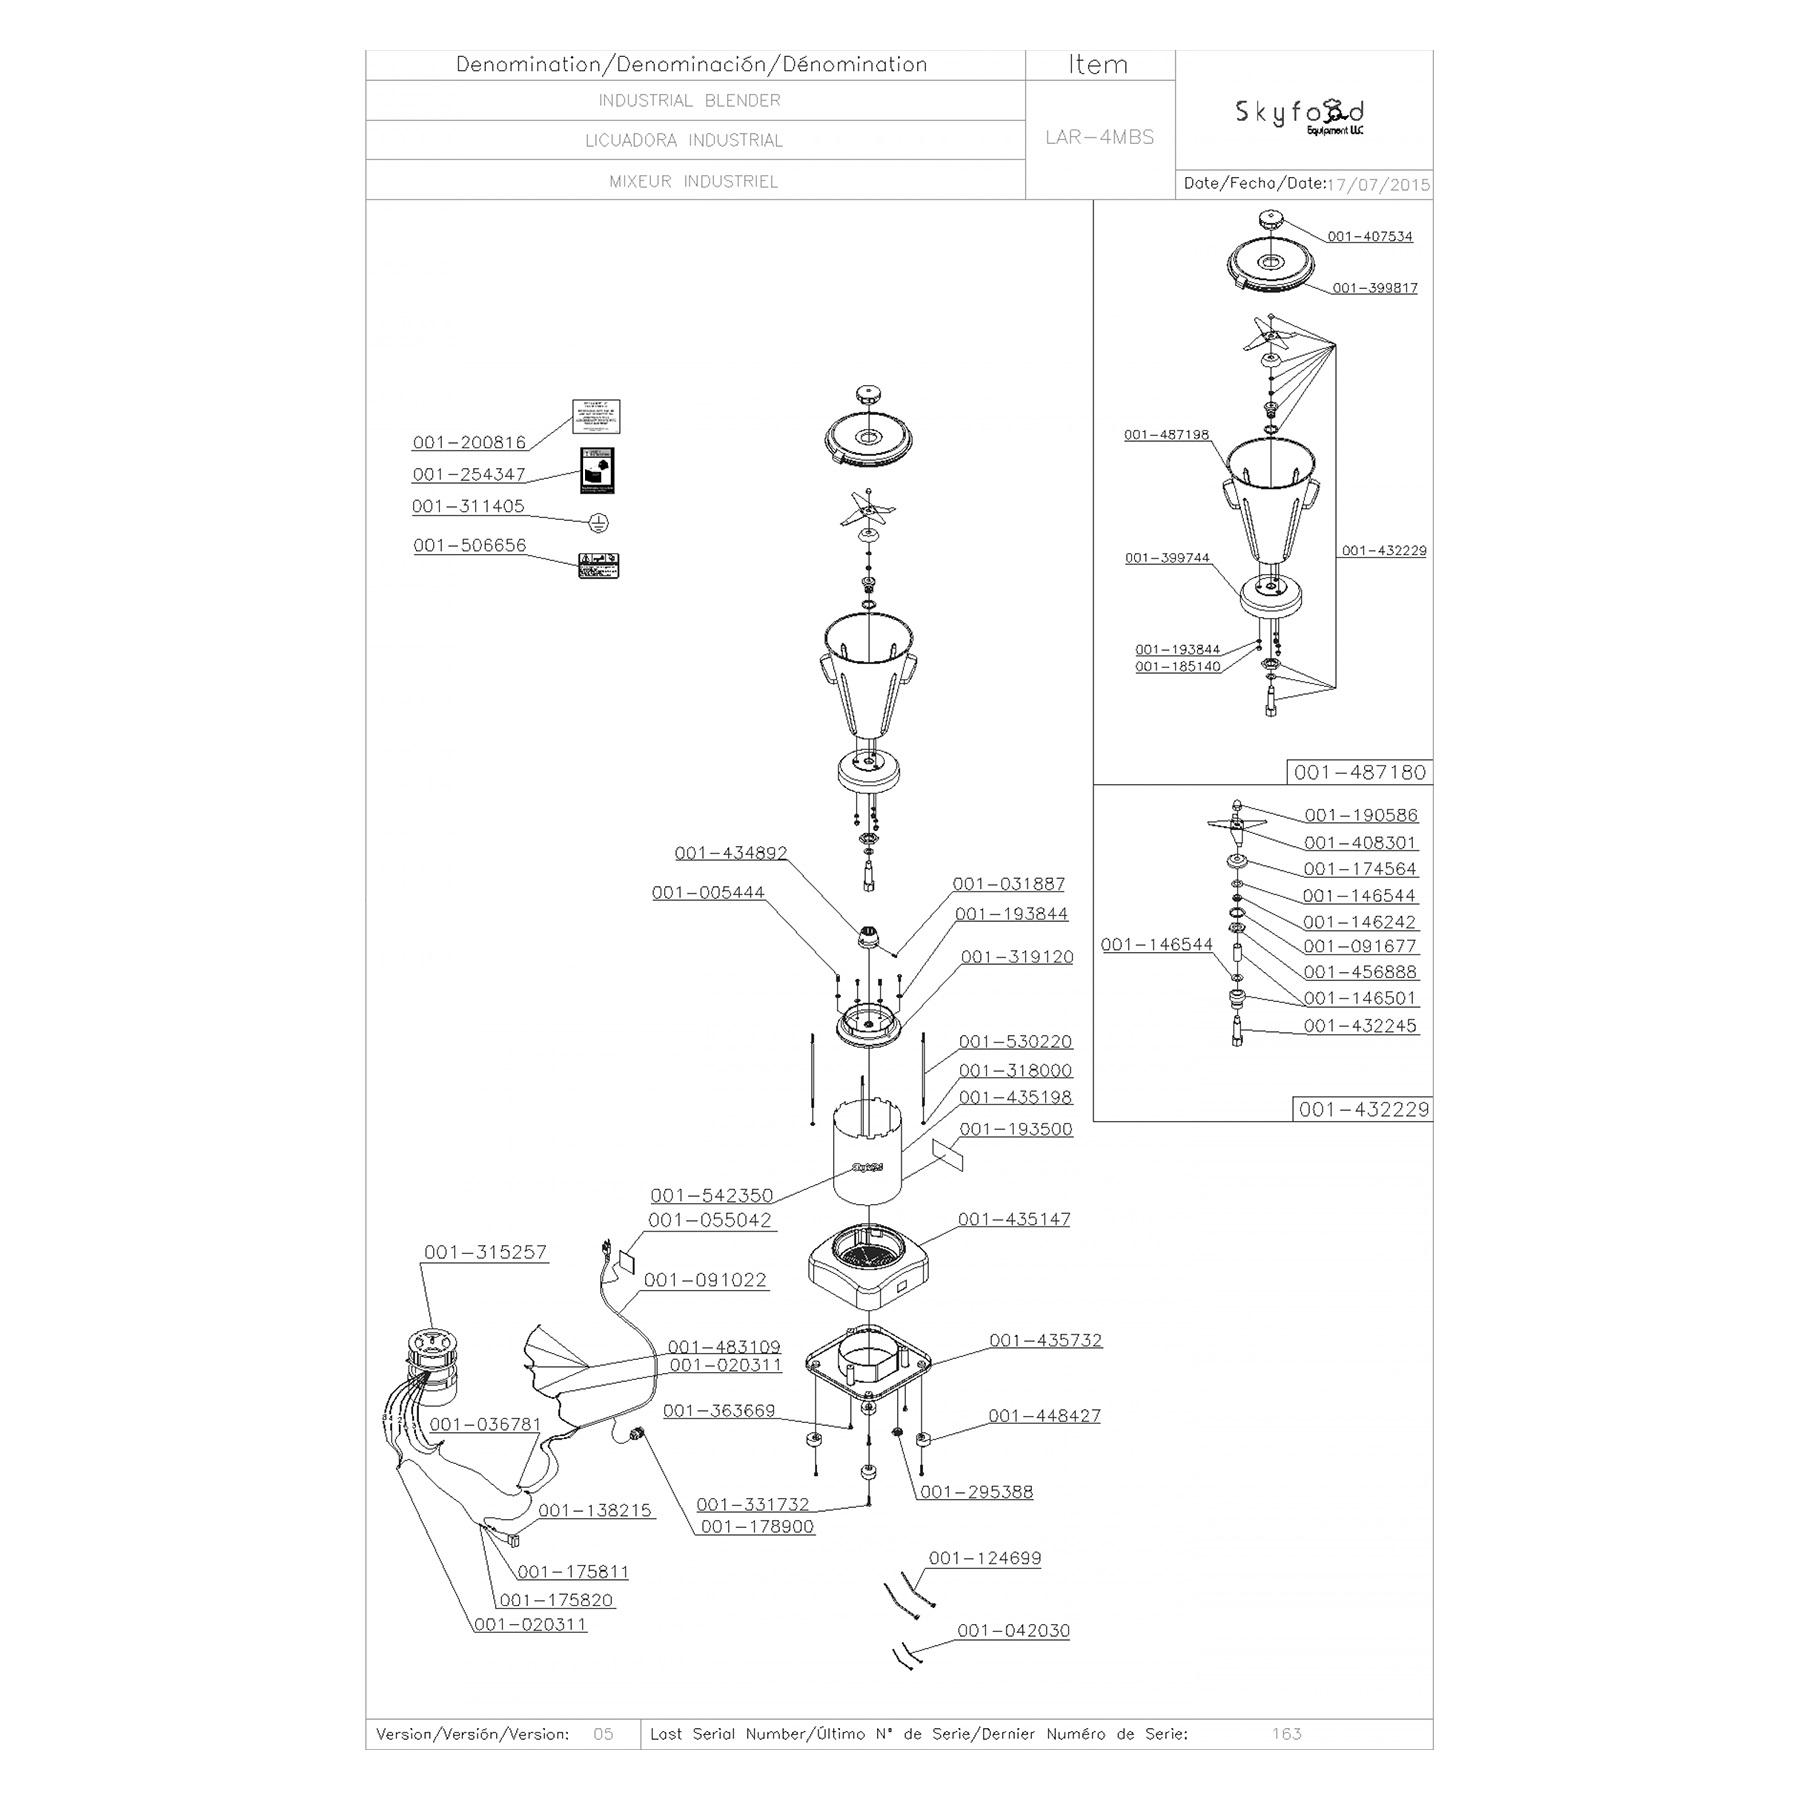 Skyfood LAR-4MBS 1 Gal Food Blender 3,500 RPM 1/2 HP